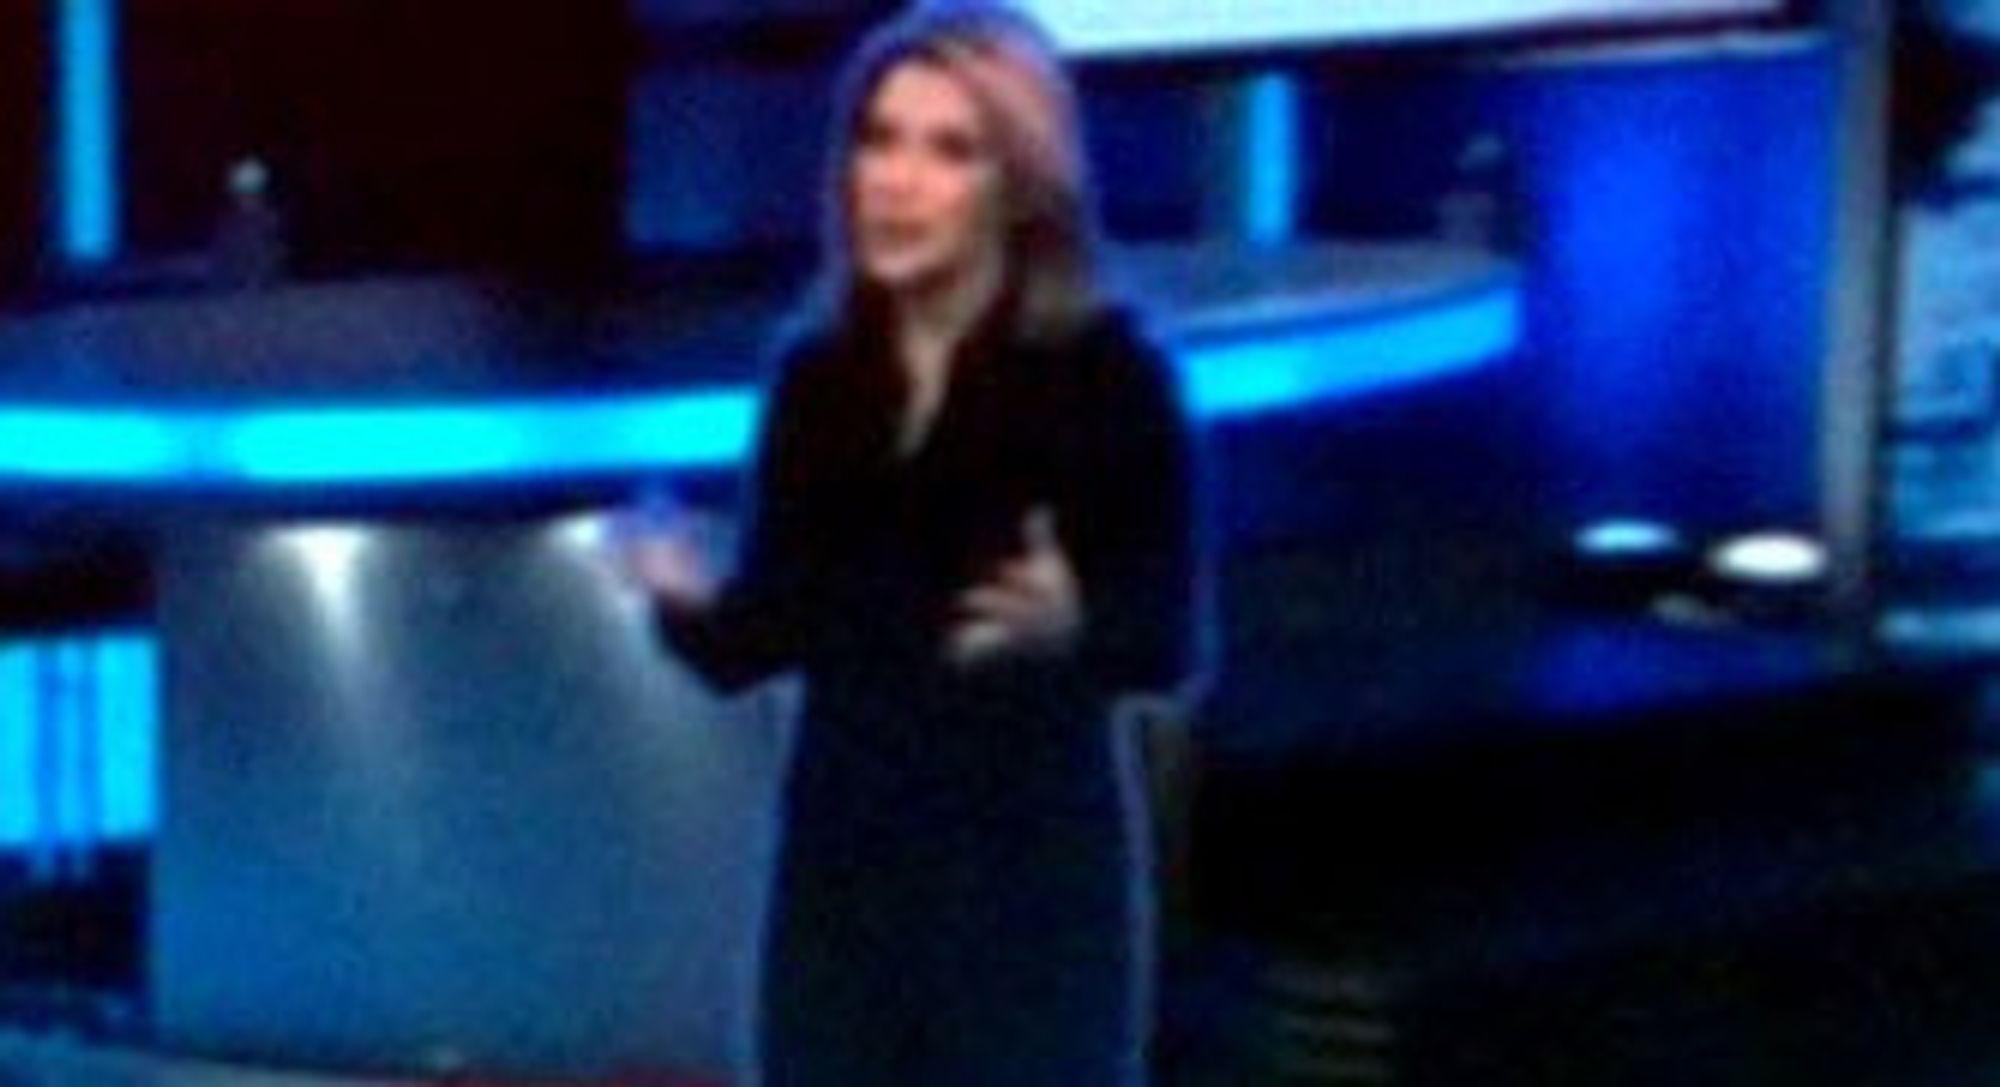 CNN Star Wars hologram.